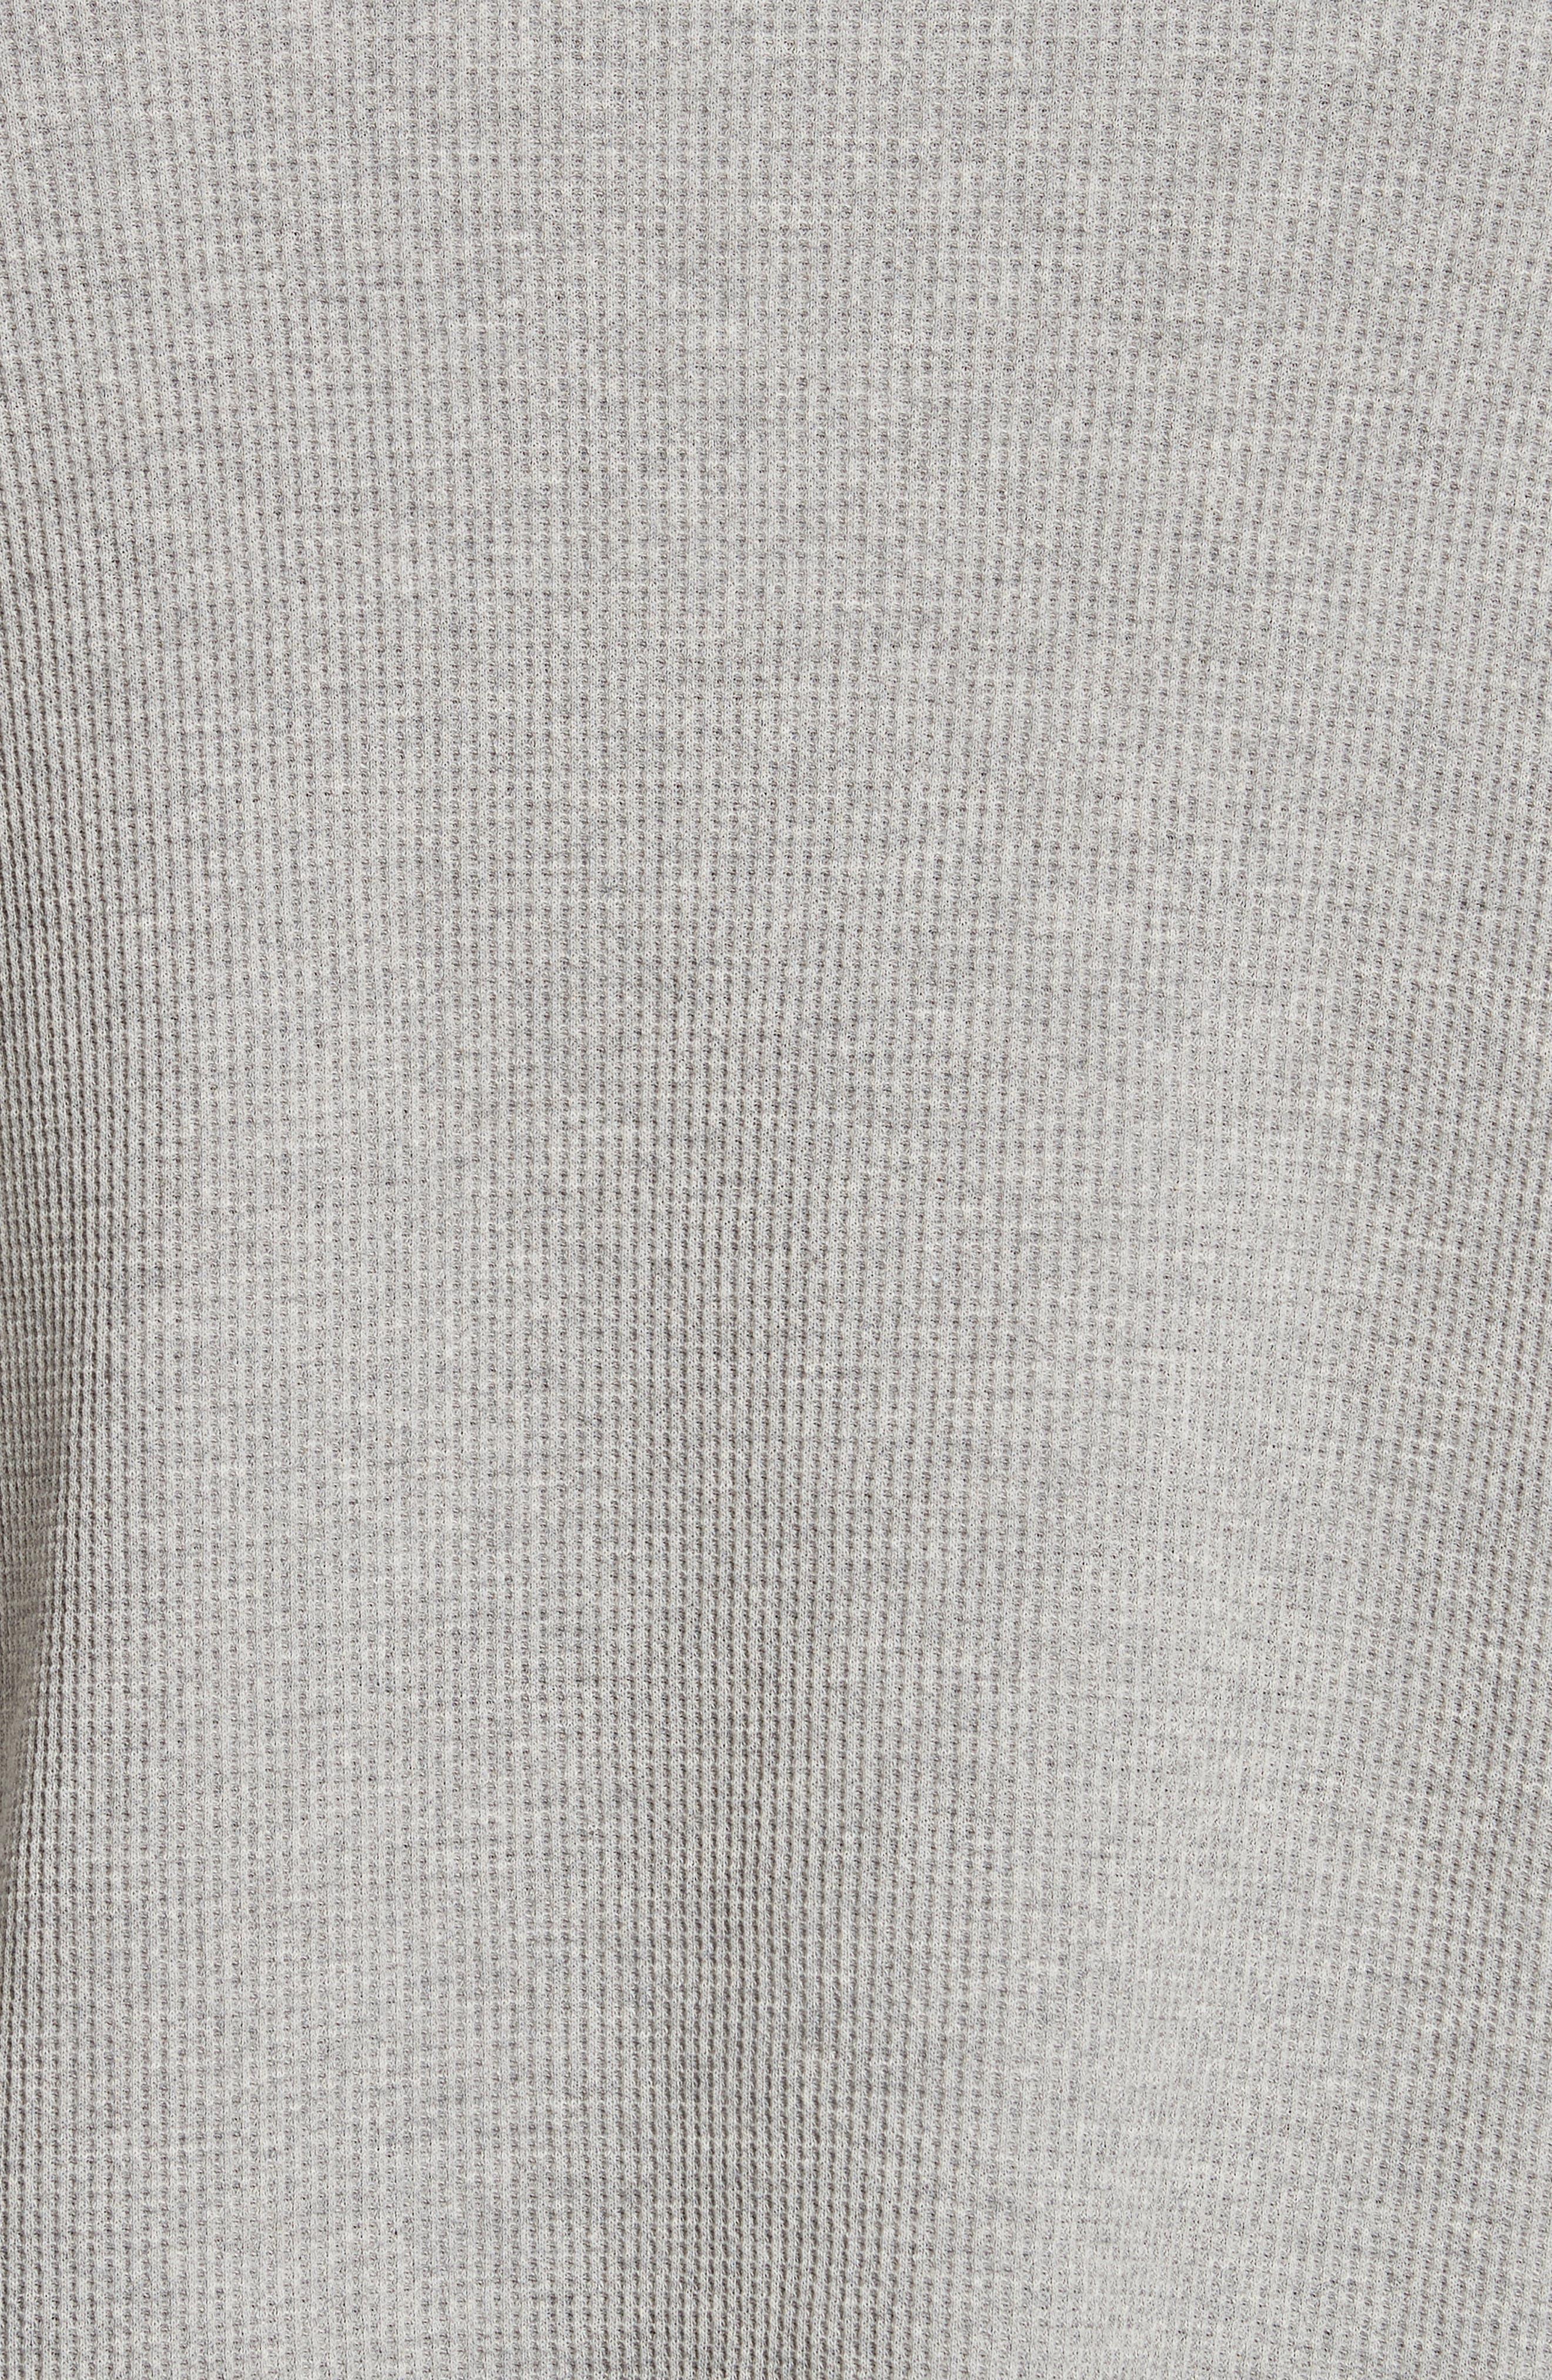 Military Panel Sleeve Thermal Shirt,                             Alternate thumbnail 5, color,                             Grey Melange